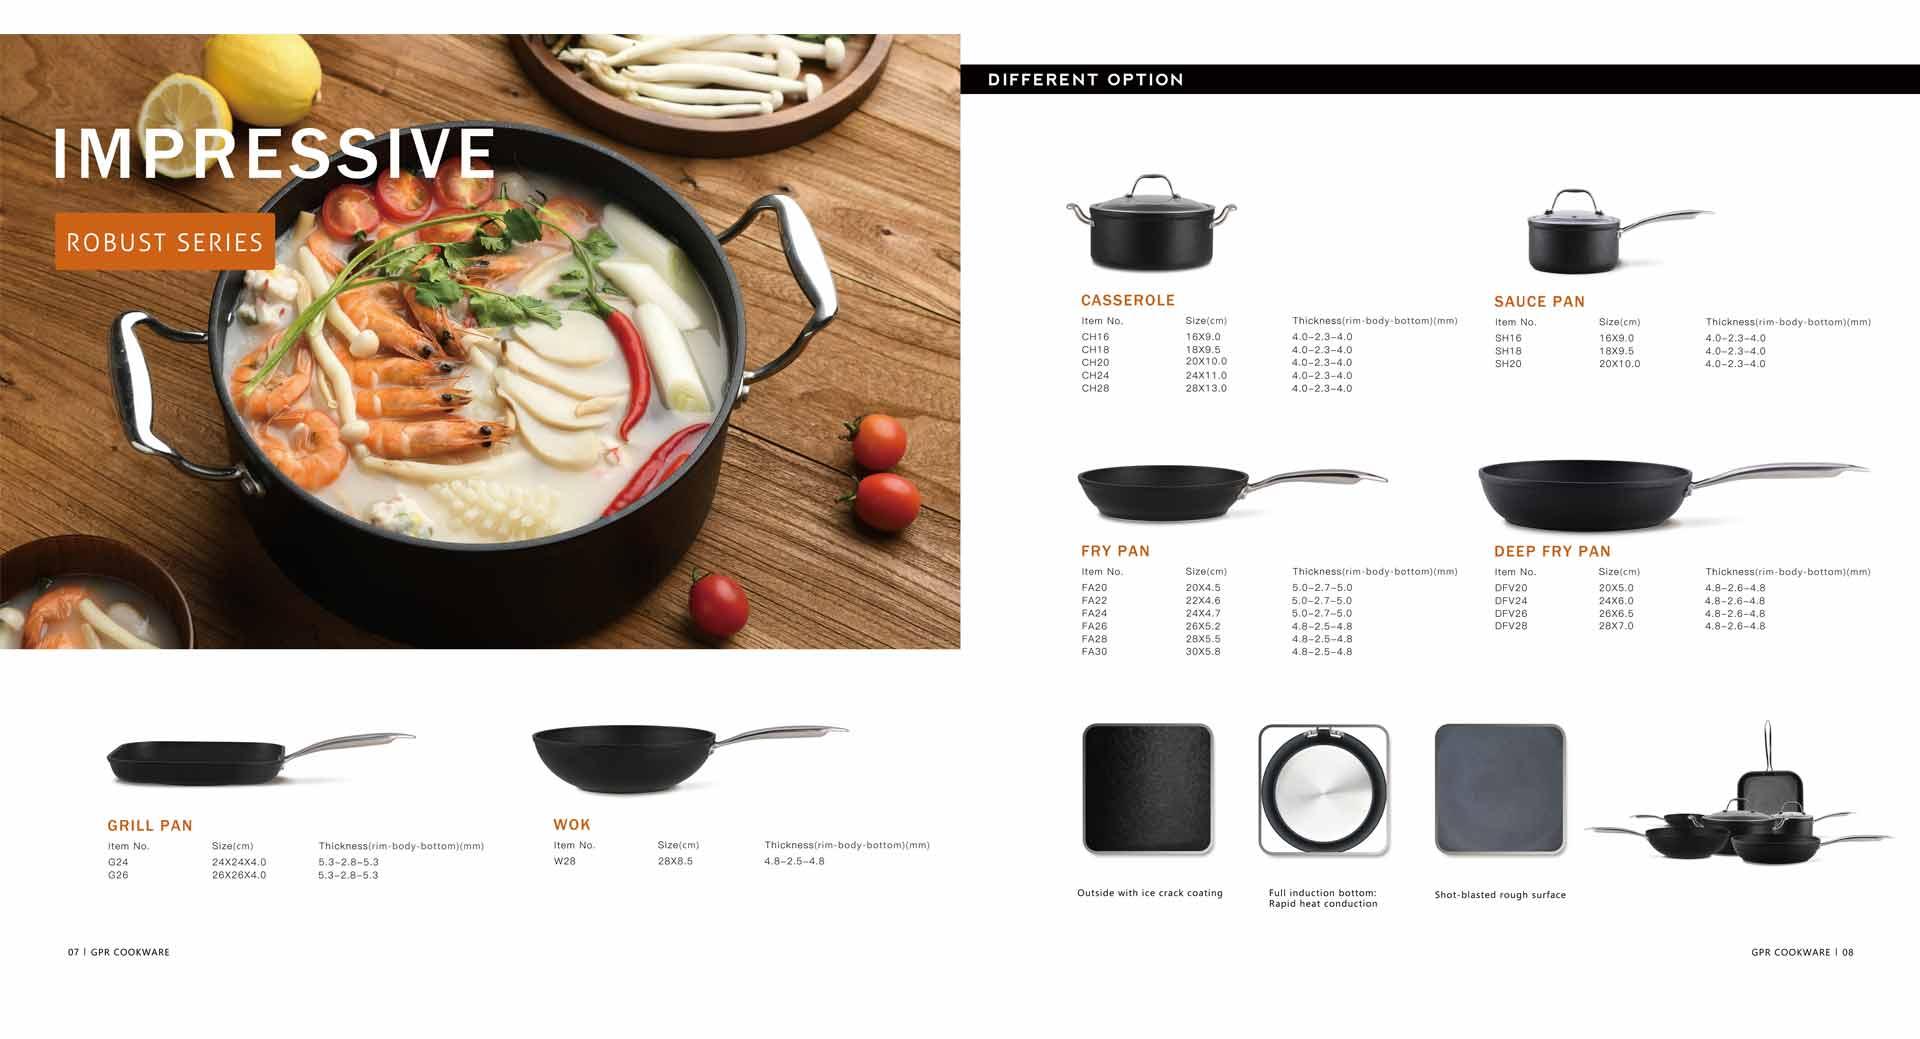 Impressive Series Cookware Set